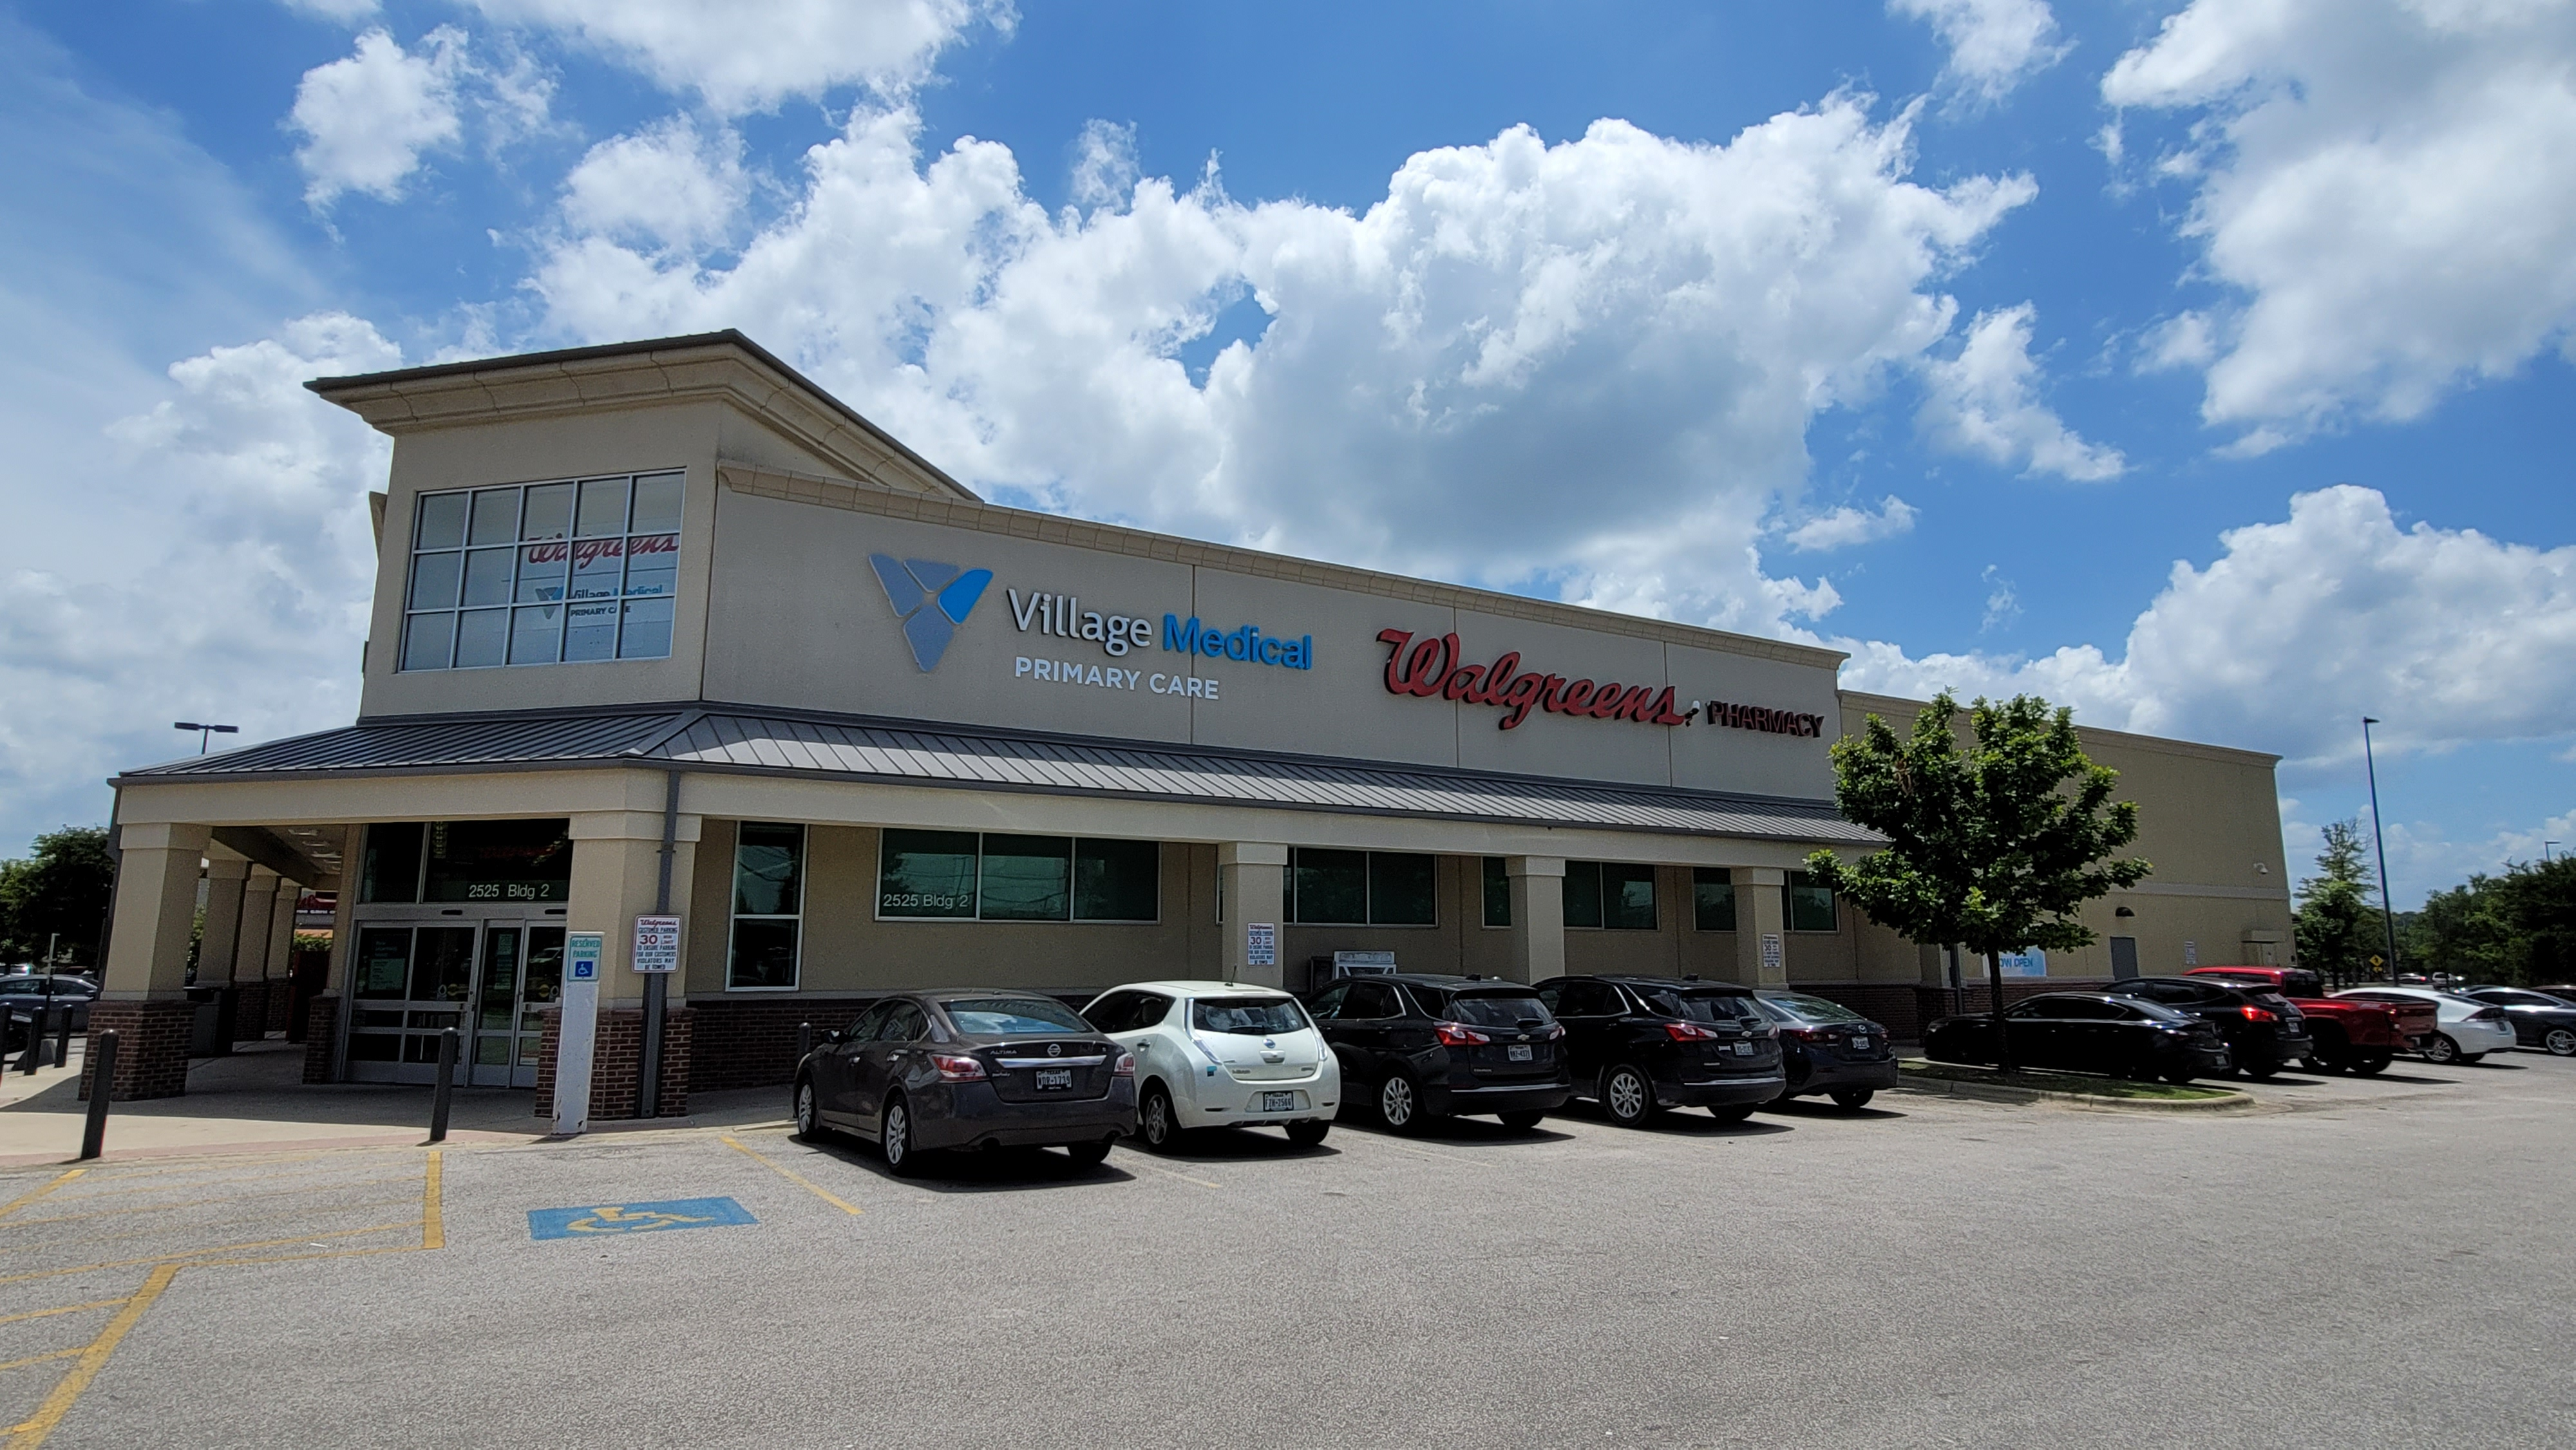 Village Medical at Walgreens - 2525 W Anderson Ln. Bldg 2, Suite 152 Austin, TX 78757